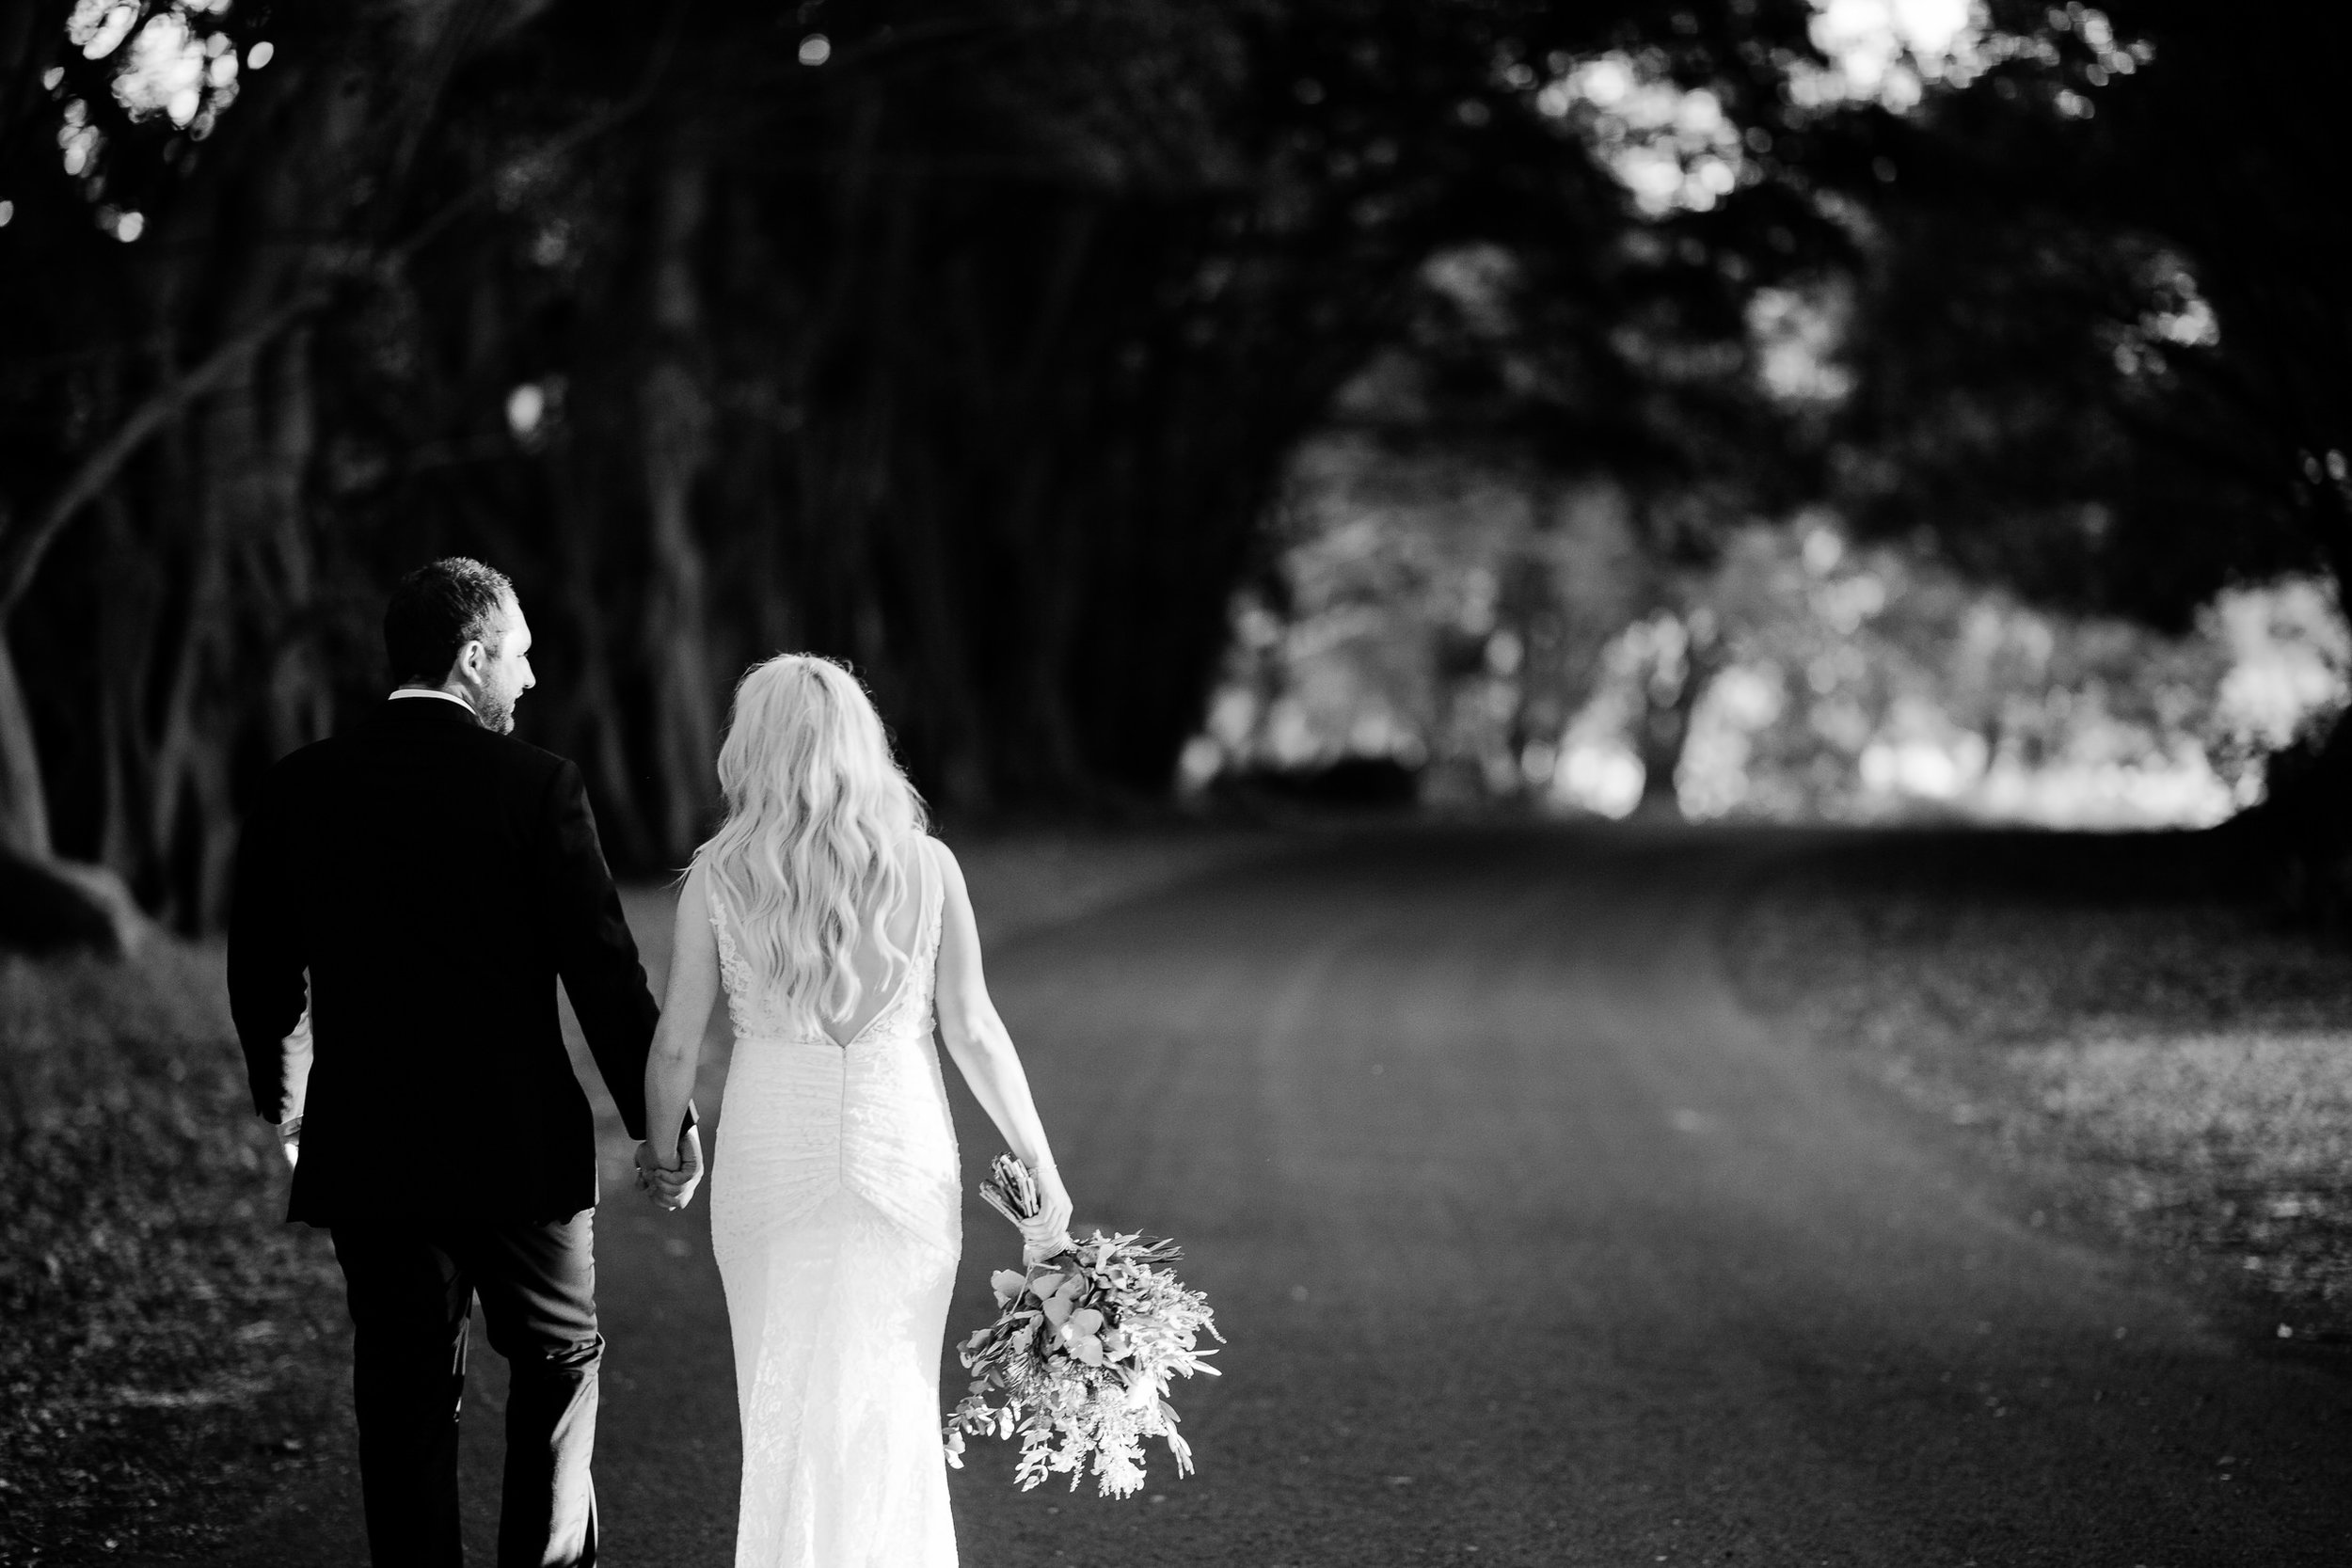 Justin_And_Jim_Photography_Byron_Bay_Wedding078.JPG